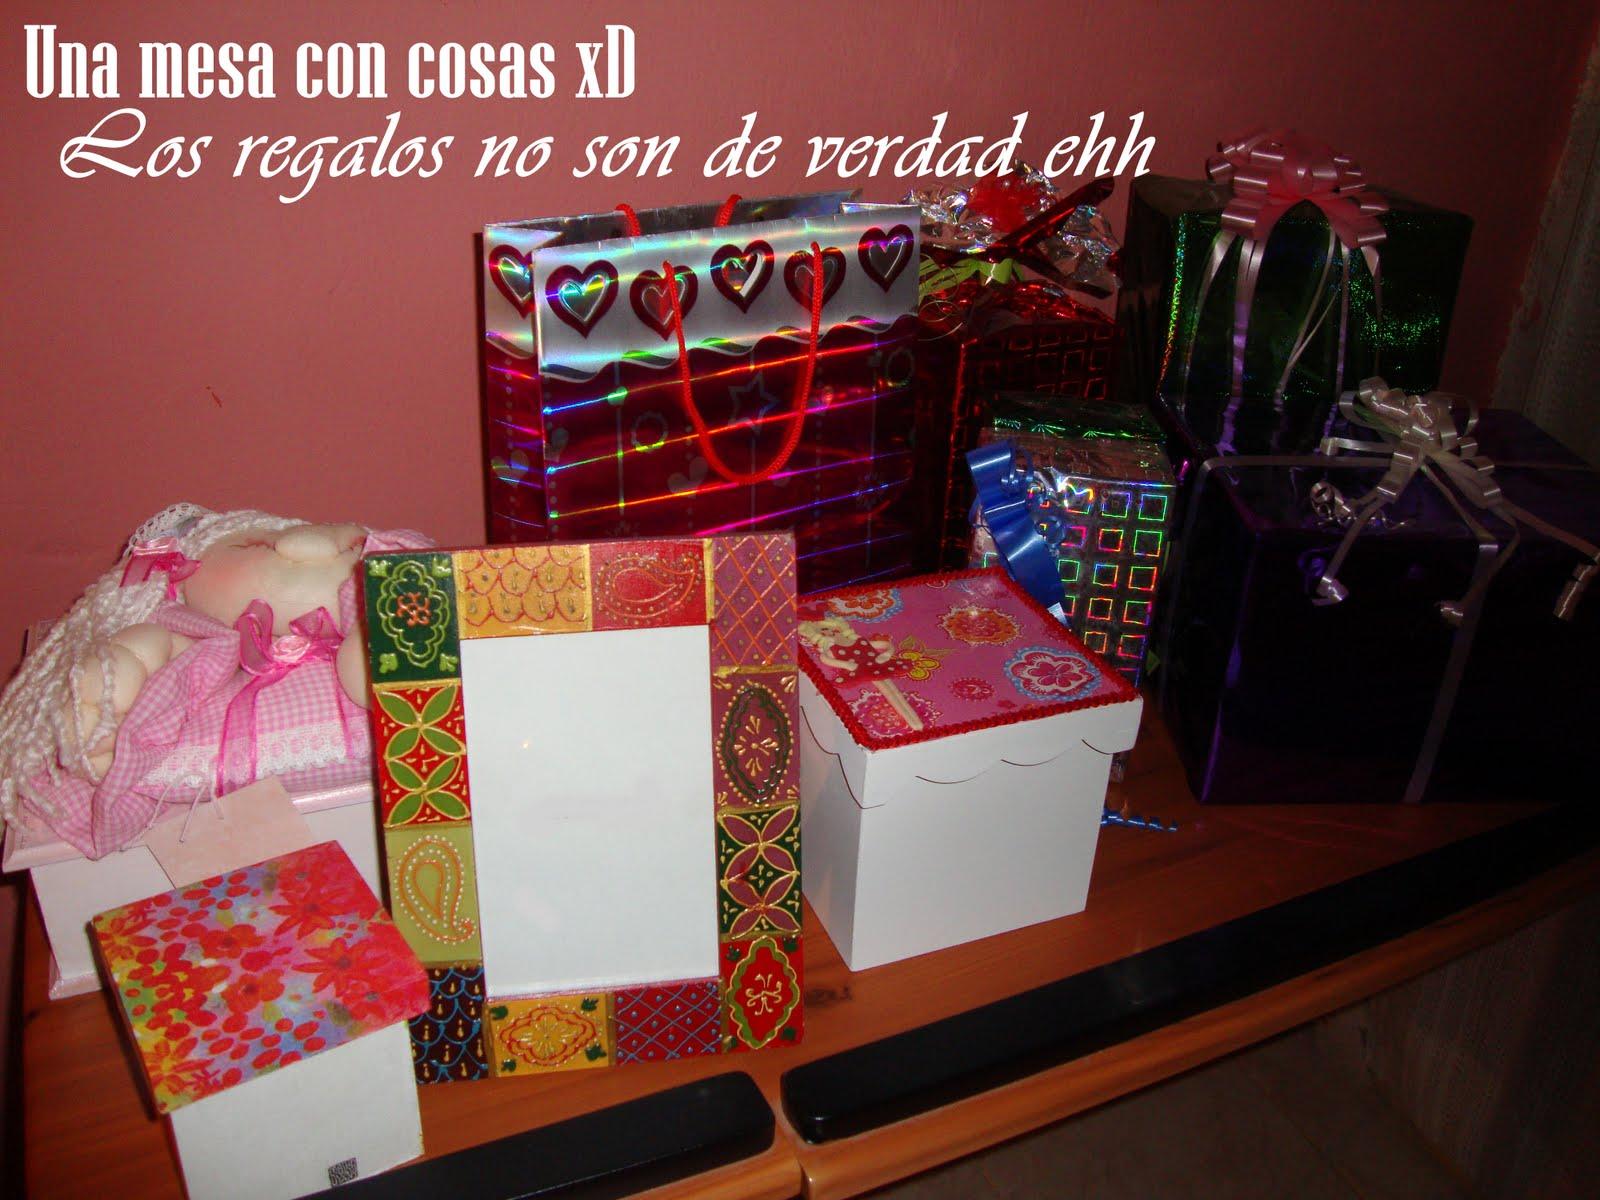 http://2.bp.blogspot.com/_NpZlD7LNi0U/TSpXk4Iym3I/AAAAAAAABGY/XCq3rCbl2vE/s1600/DSC01260.JPG